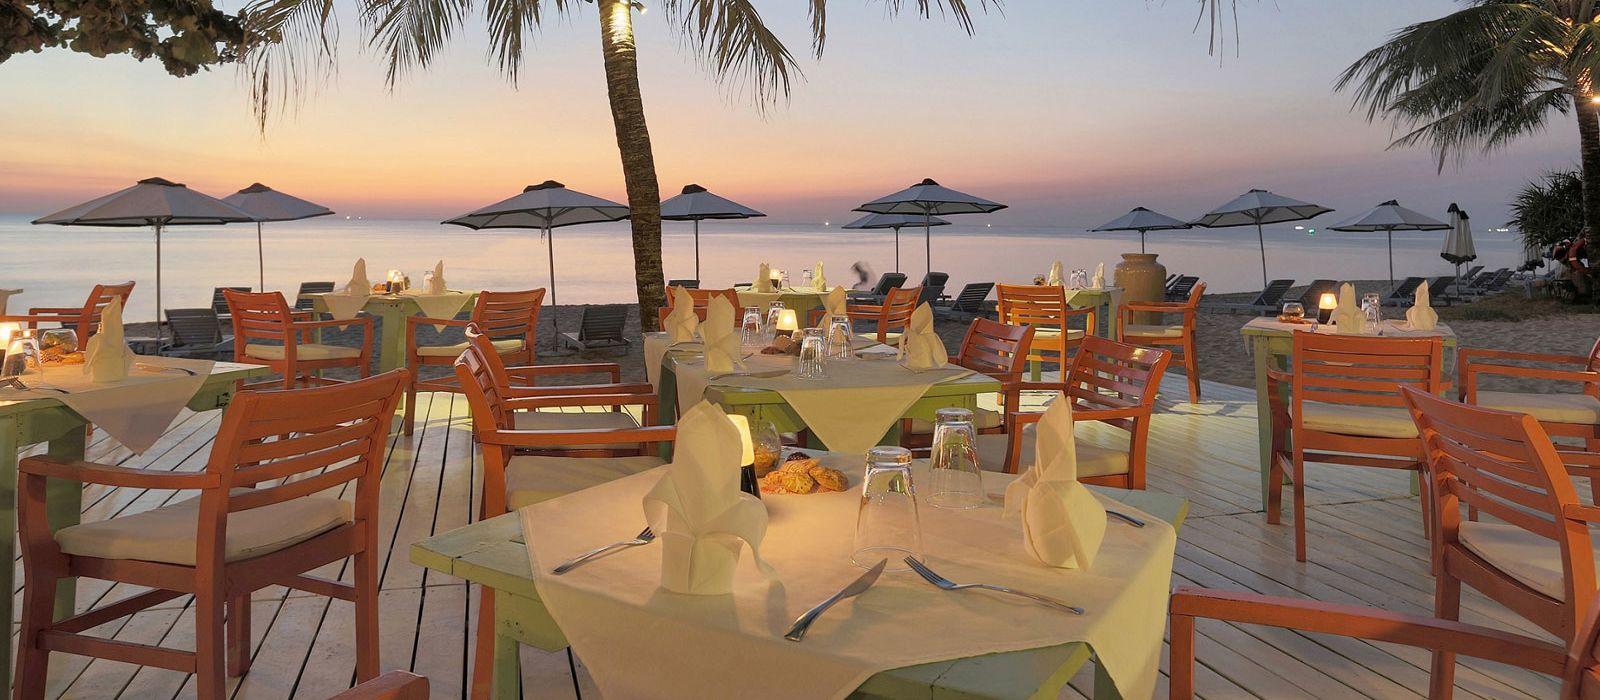 Hotel La Veranda Resort (Phu Quoc Island) Vietnam